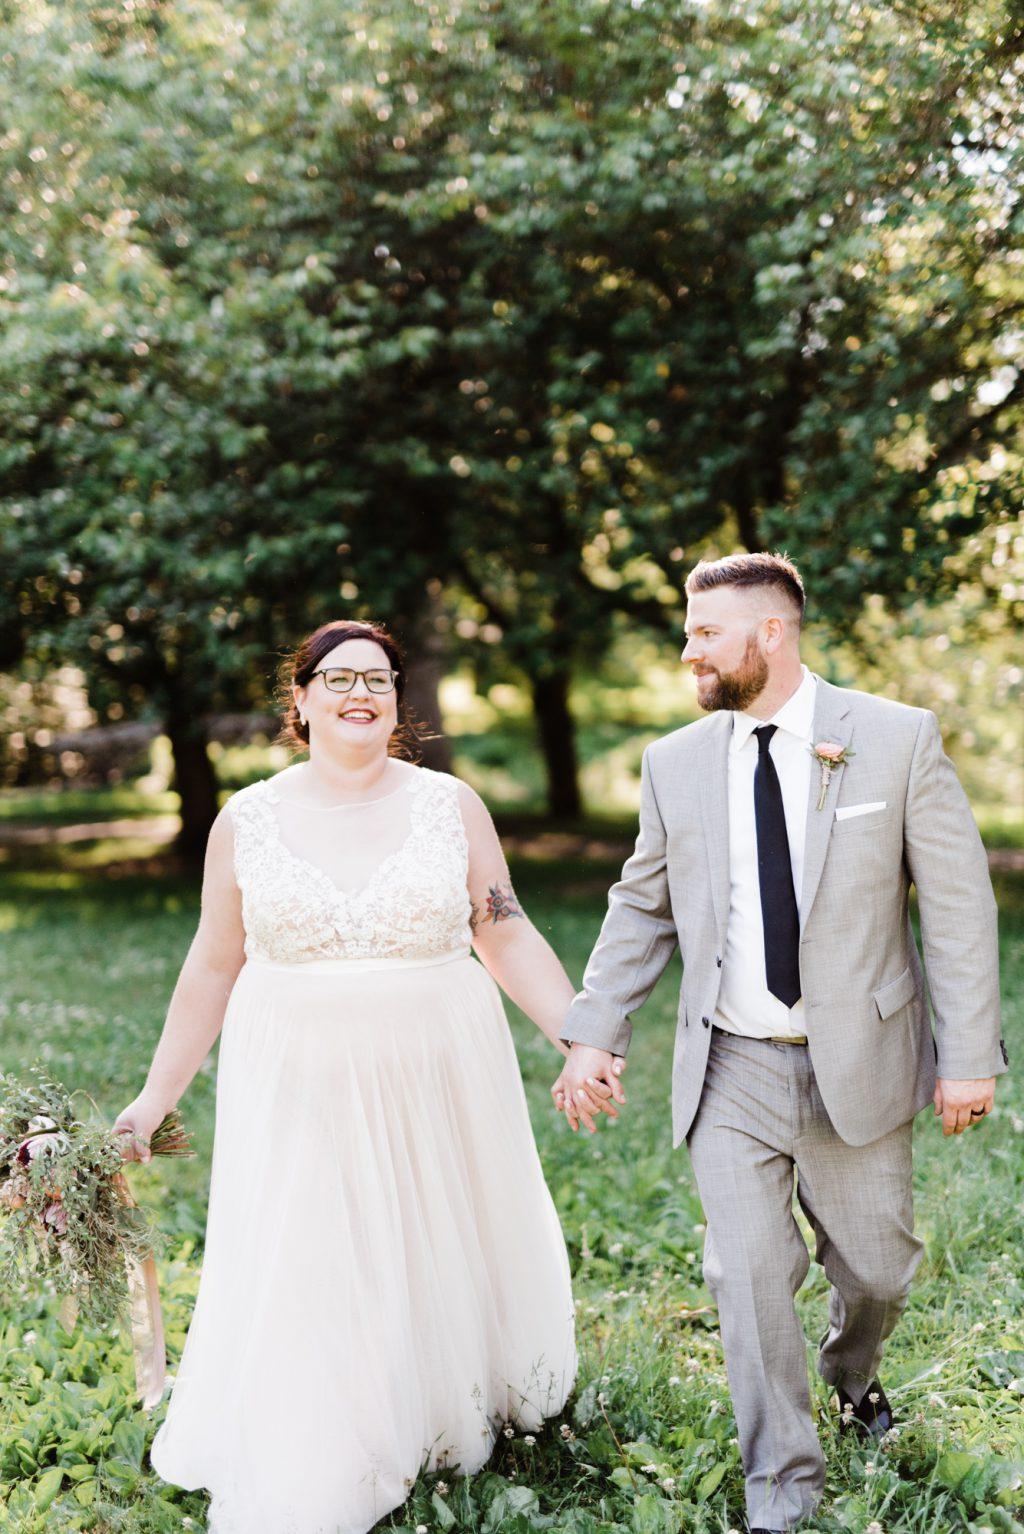 haley-richter-photo-west-chester-summer-wedding-boxcar-brewery-153